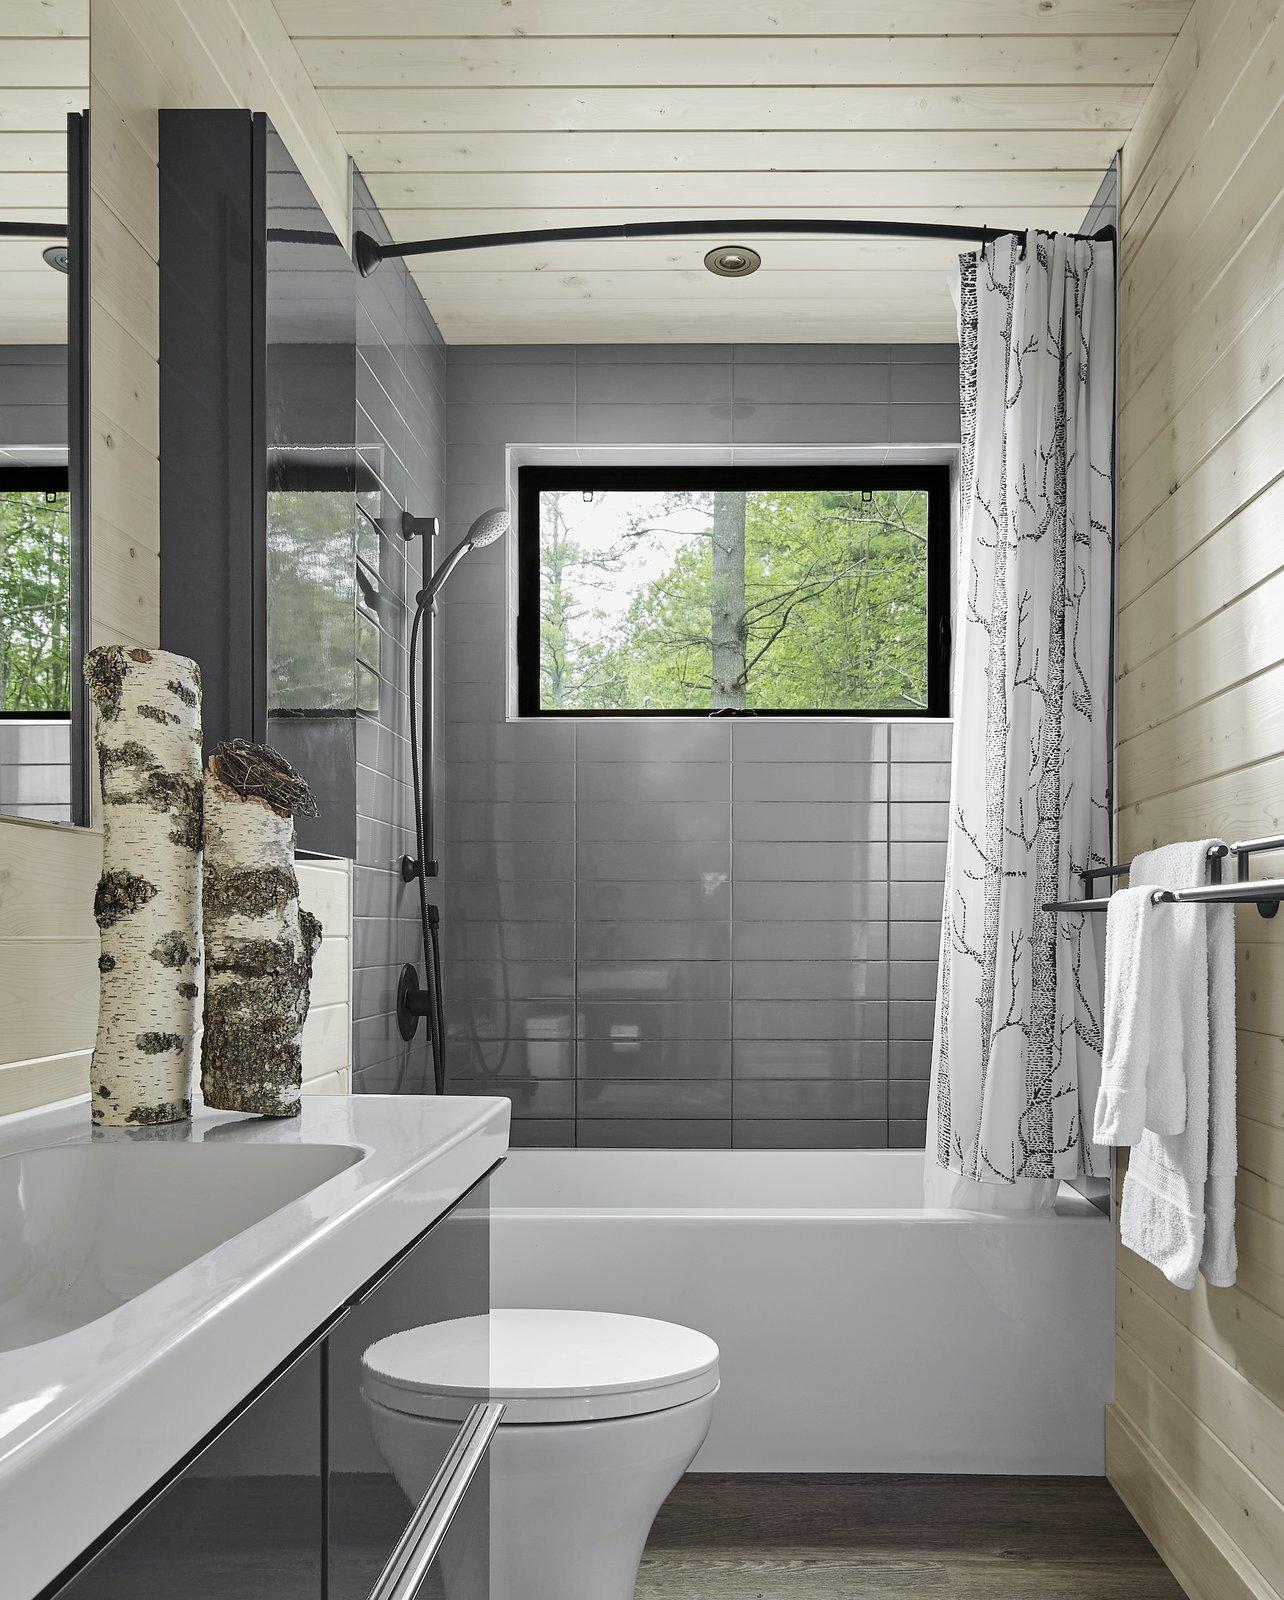 Bathroom of Kahshe Lake Cottage by Solares Architecture.